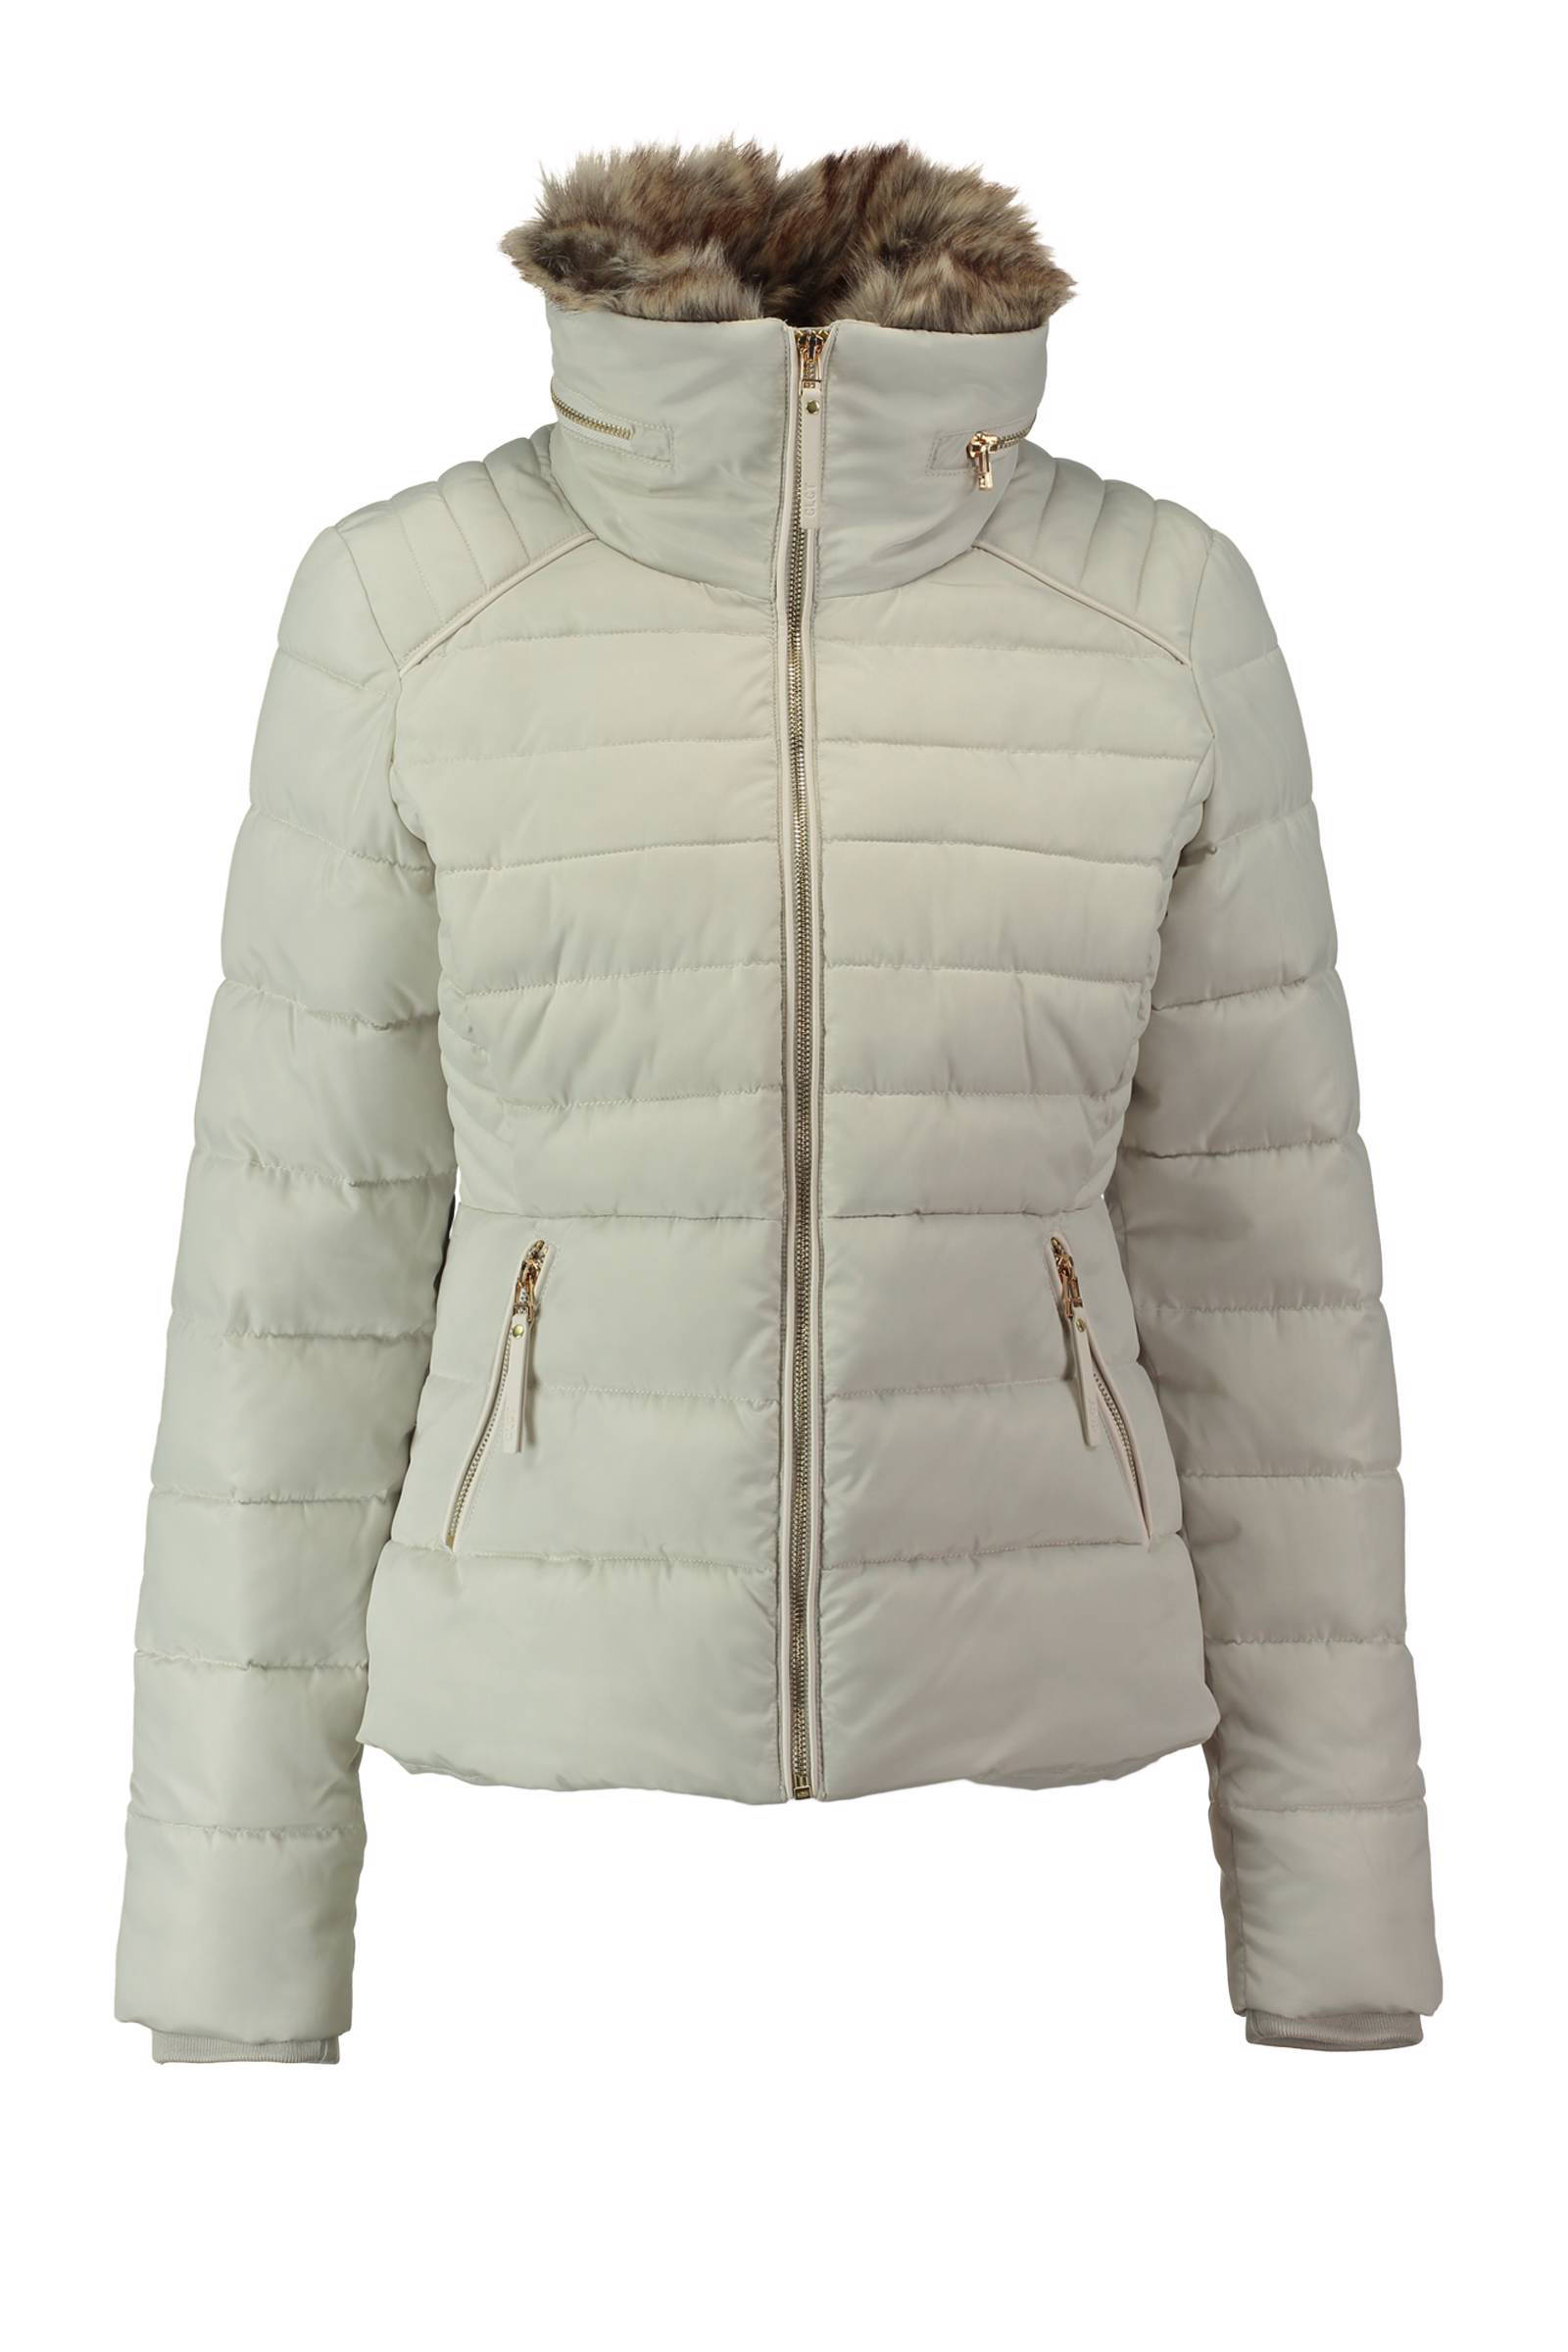 coolcat jassen dames sale